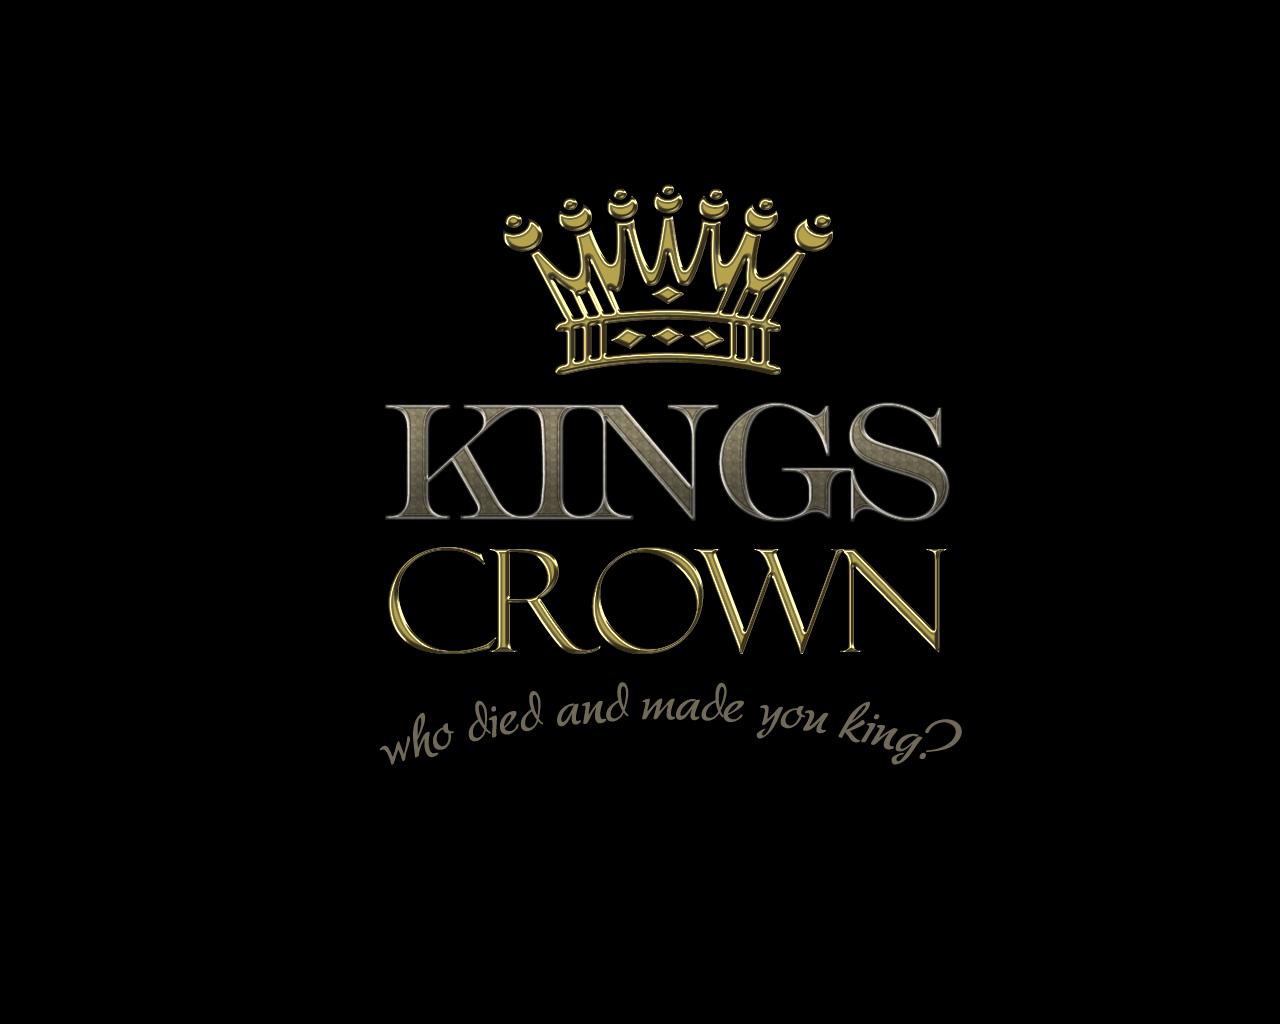 King Crown Wallpaper King Crown Logo 1280x1024